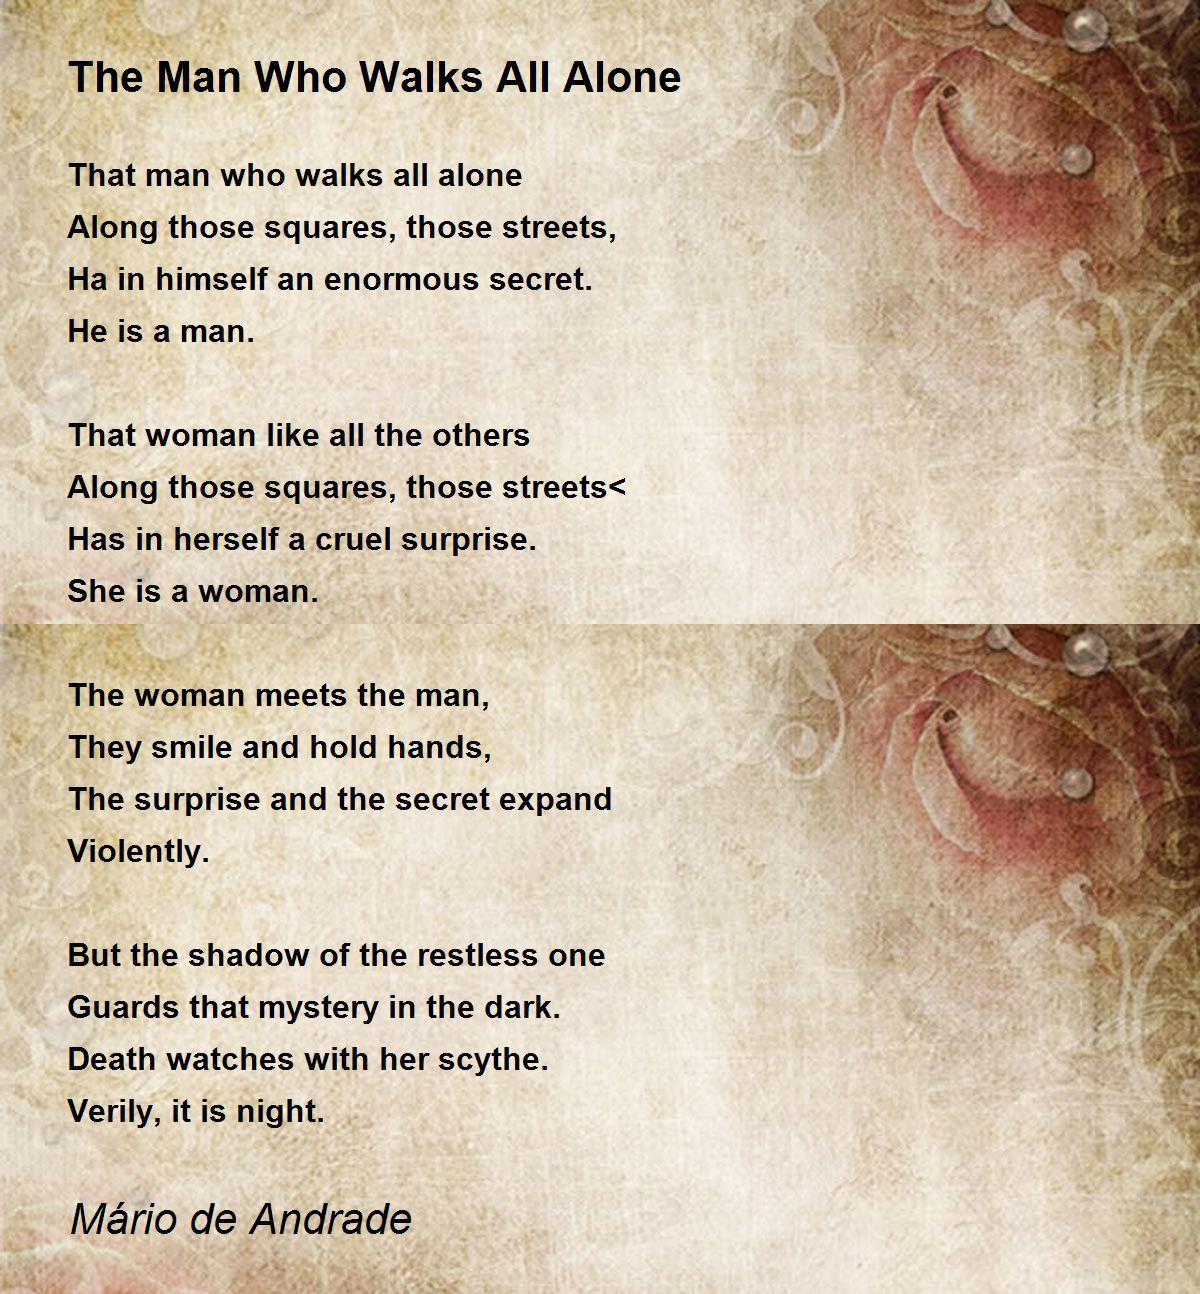 The Man Who Walks All Alone Poem by Mário de Andrade